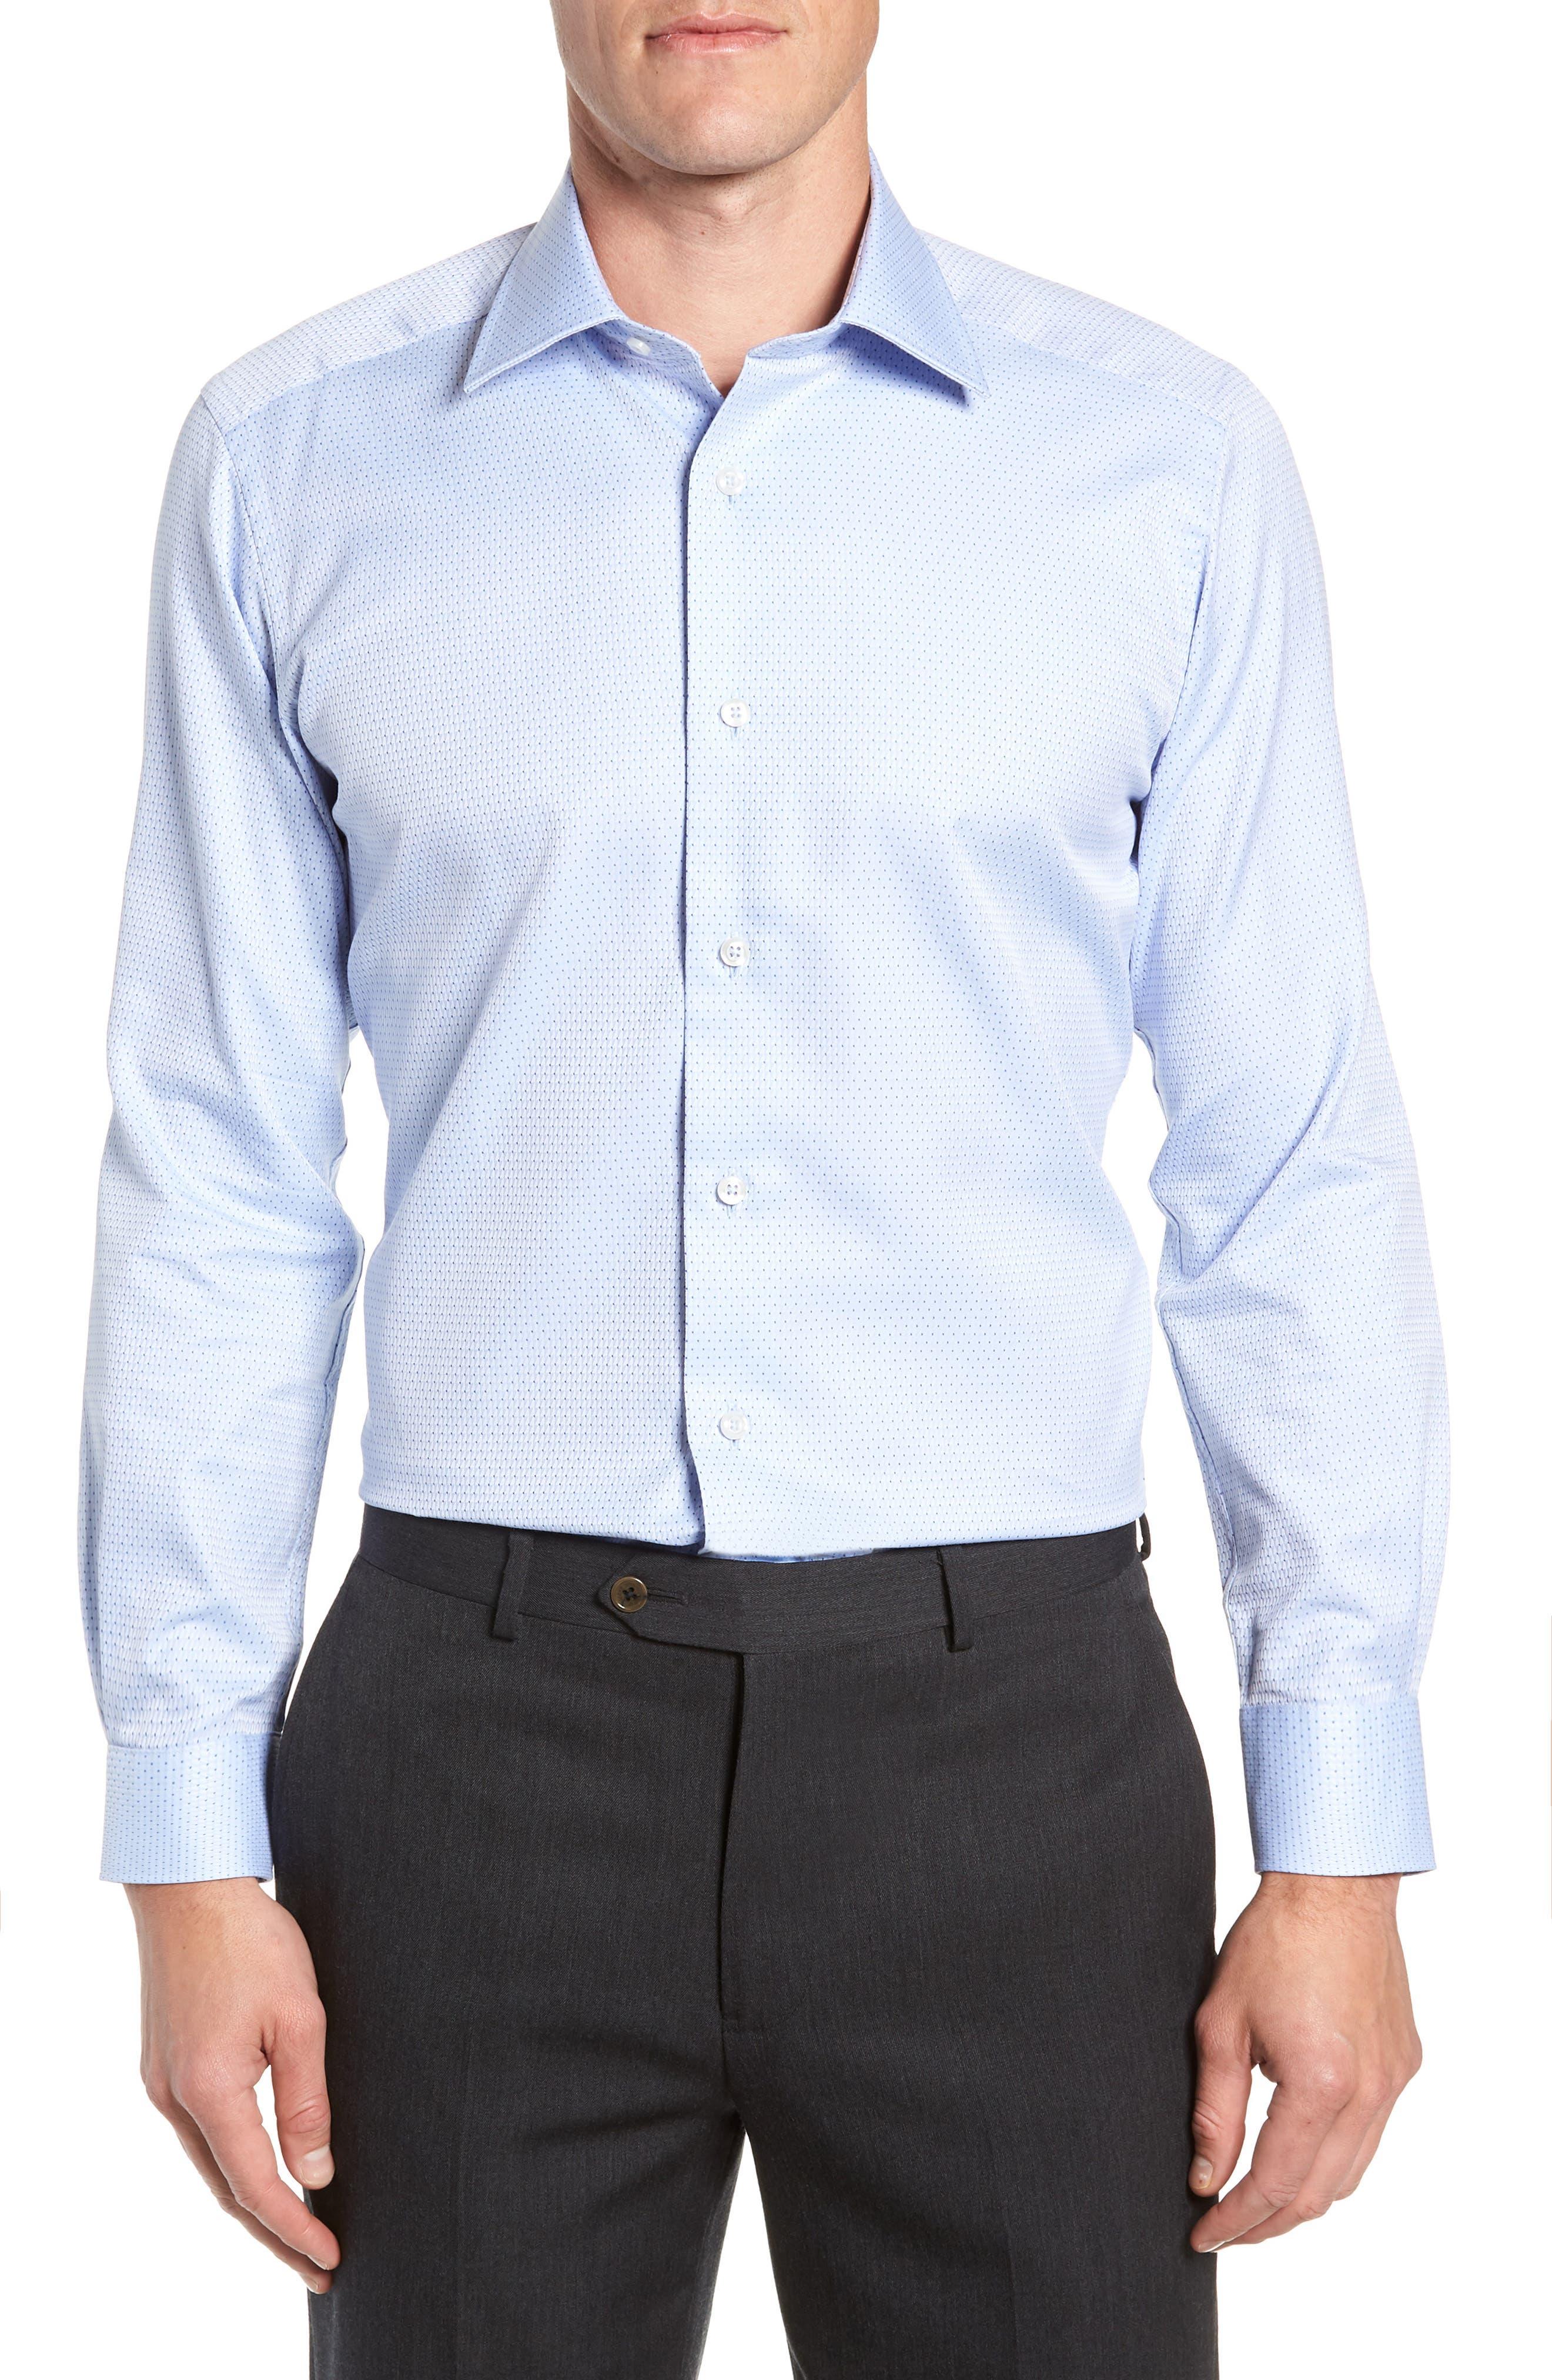 Trim Fit Check Dress Shirt,                             Main thumbnail 1, color,                             SKY/ NAVY